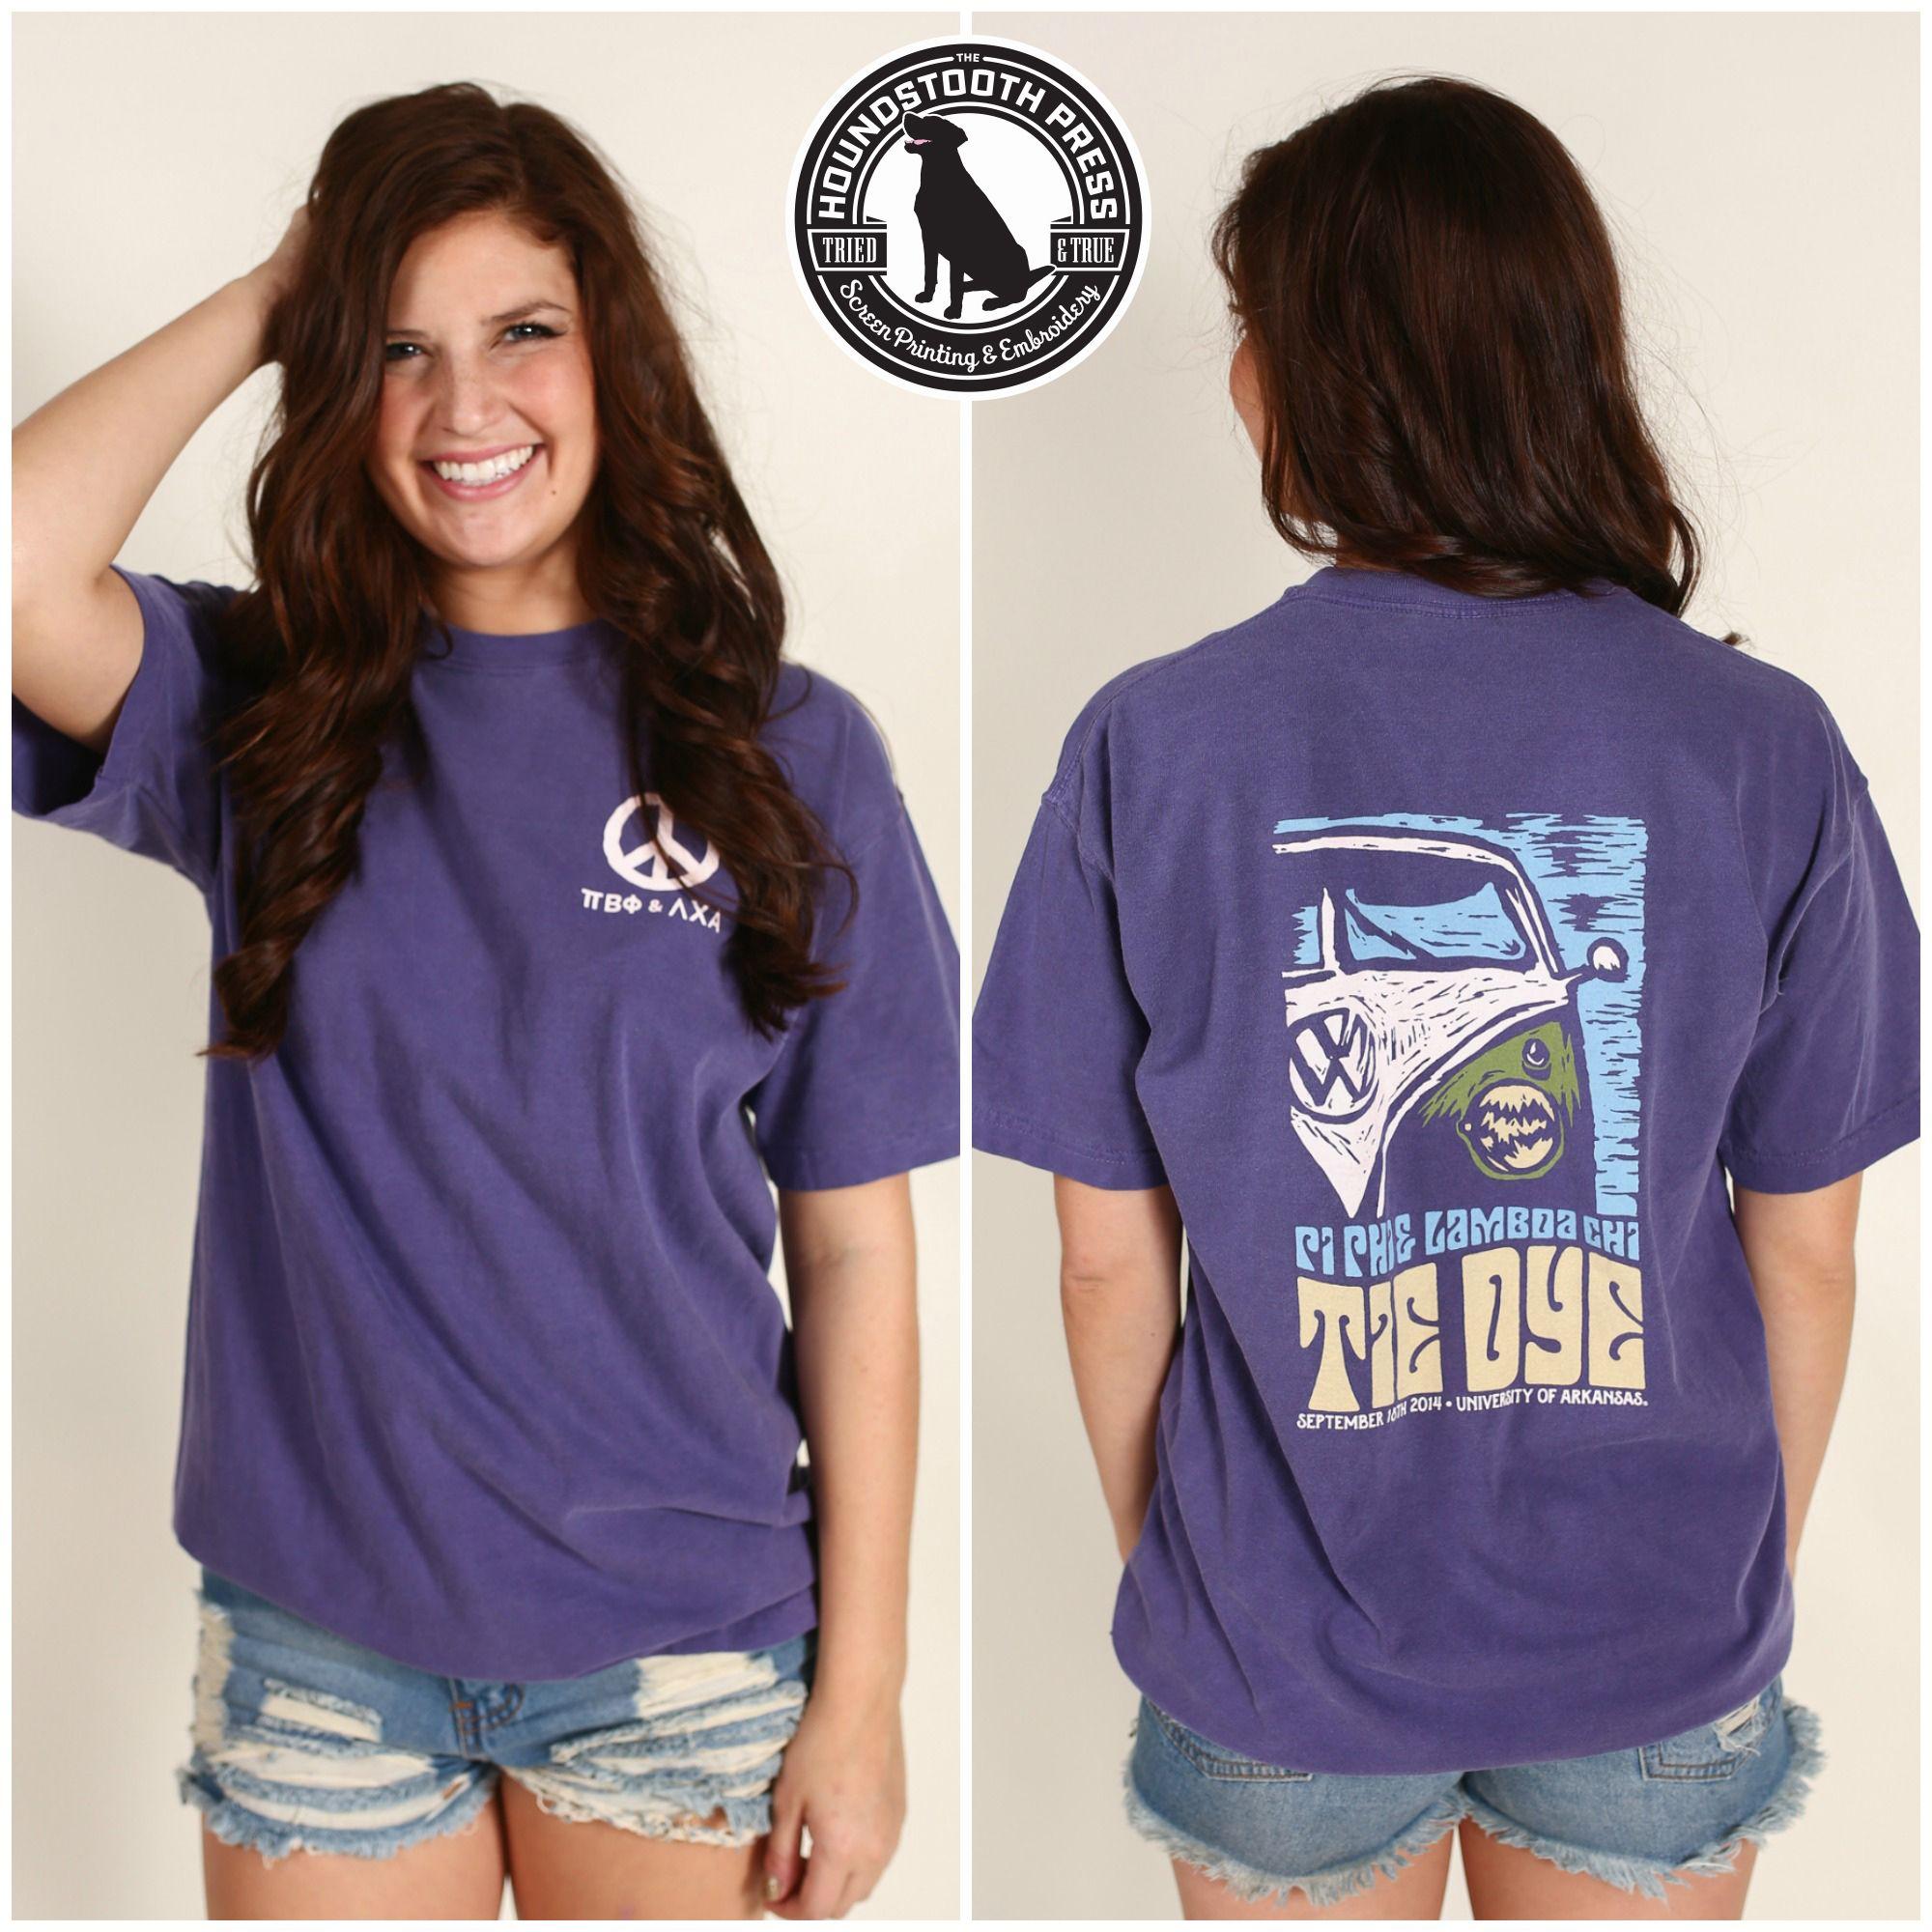 Design t shirt comfort colors - University Of Arkansas Pi Beta Phi Tie Dye Function T Shirt Comfort Colors